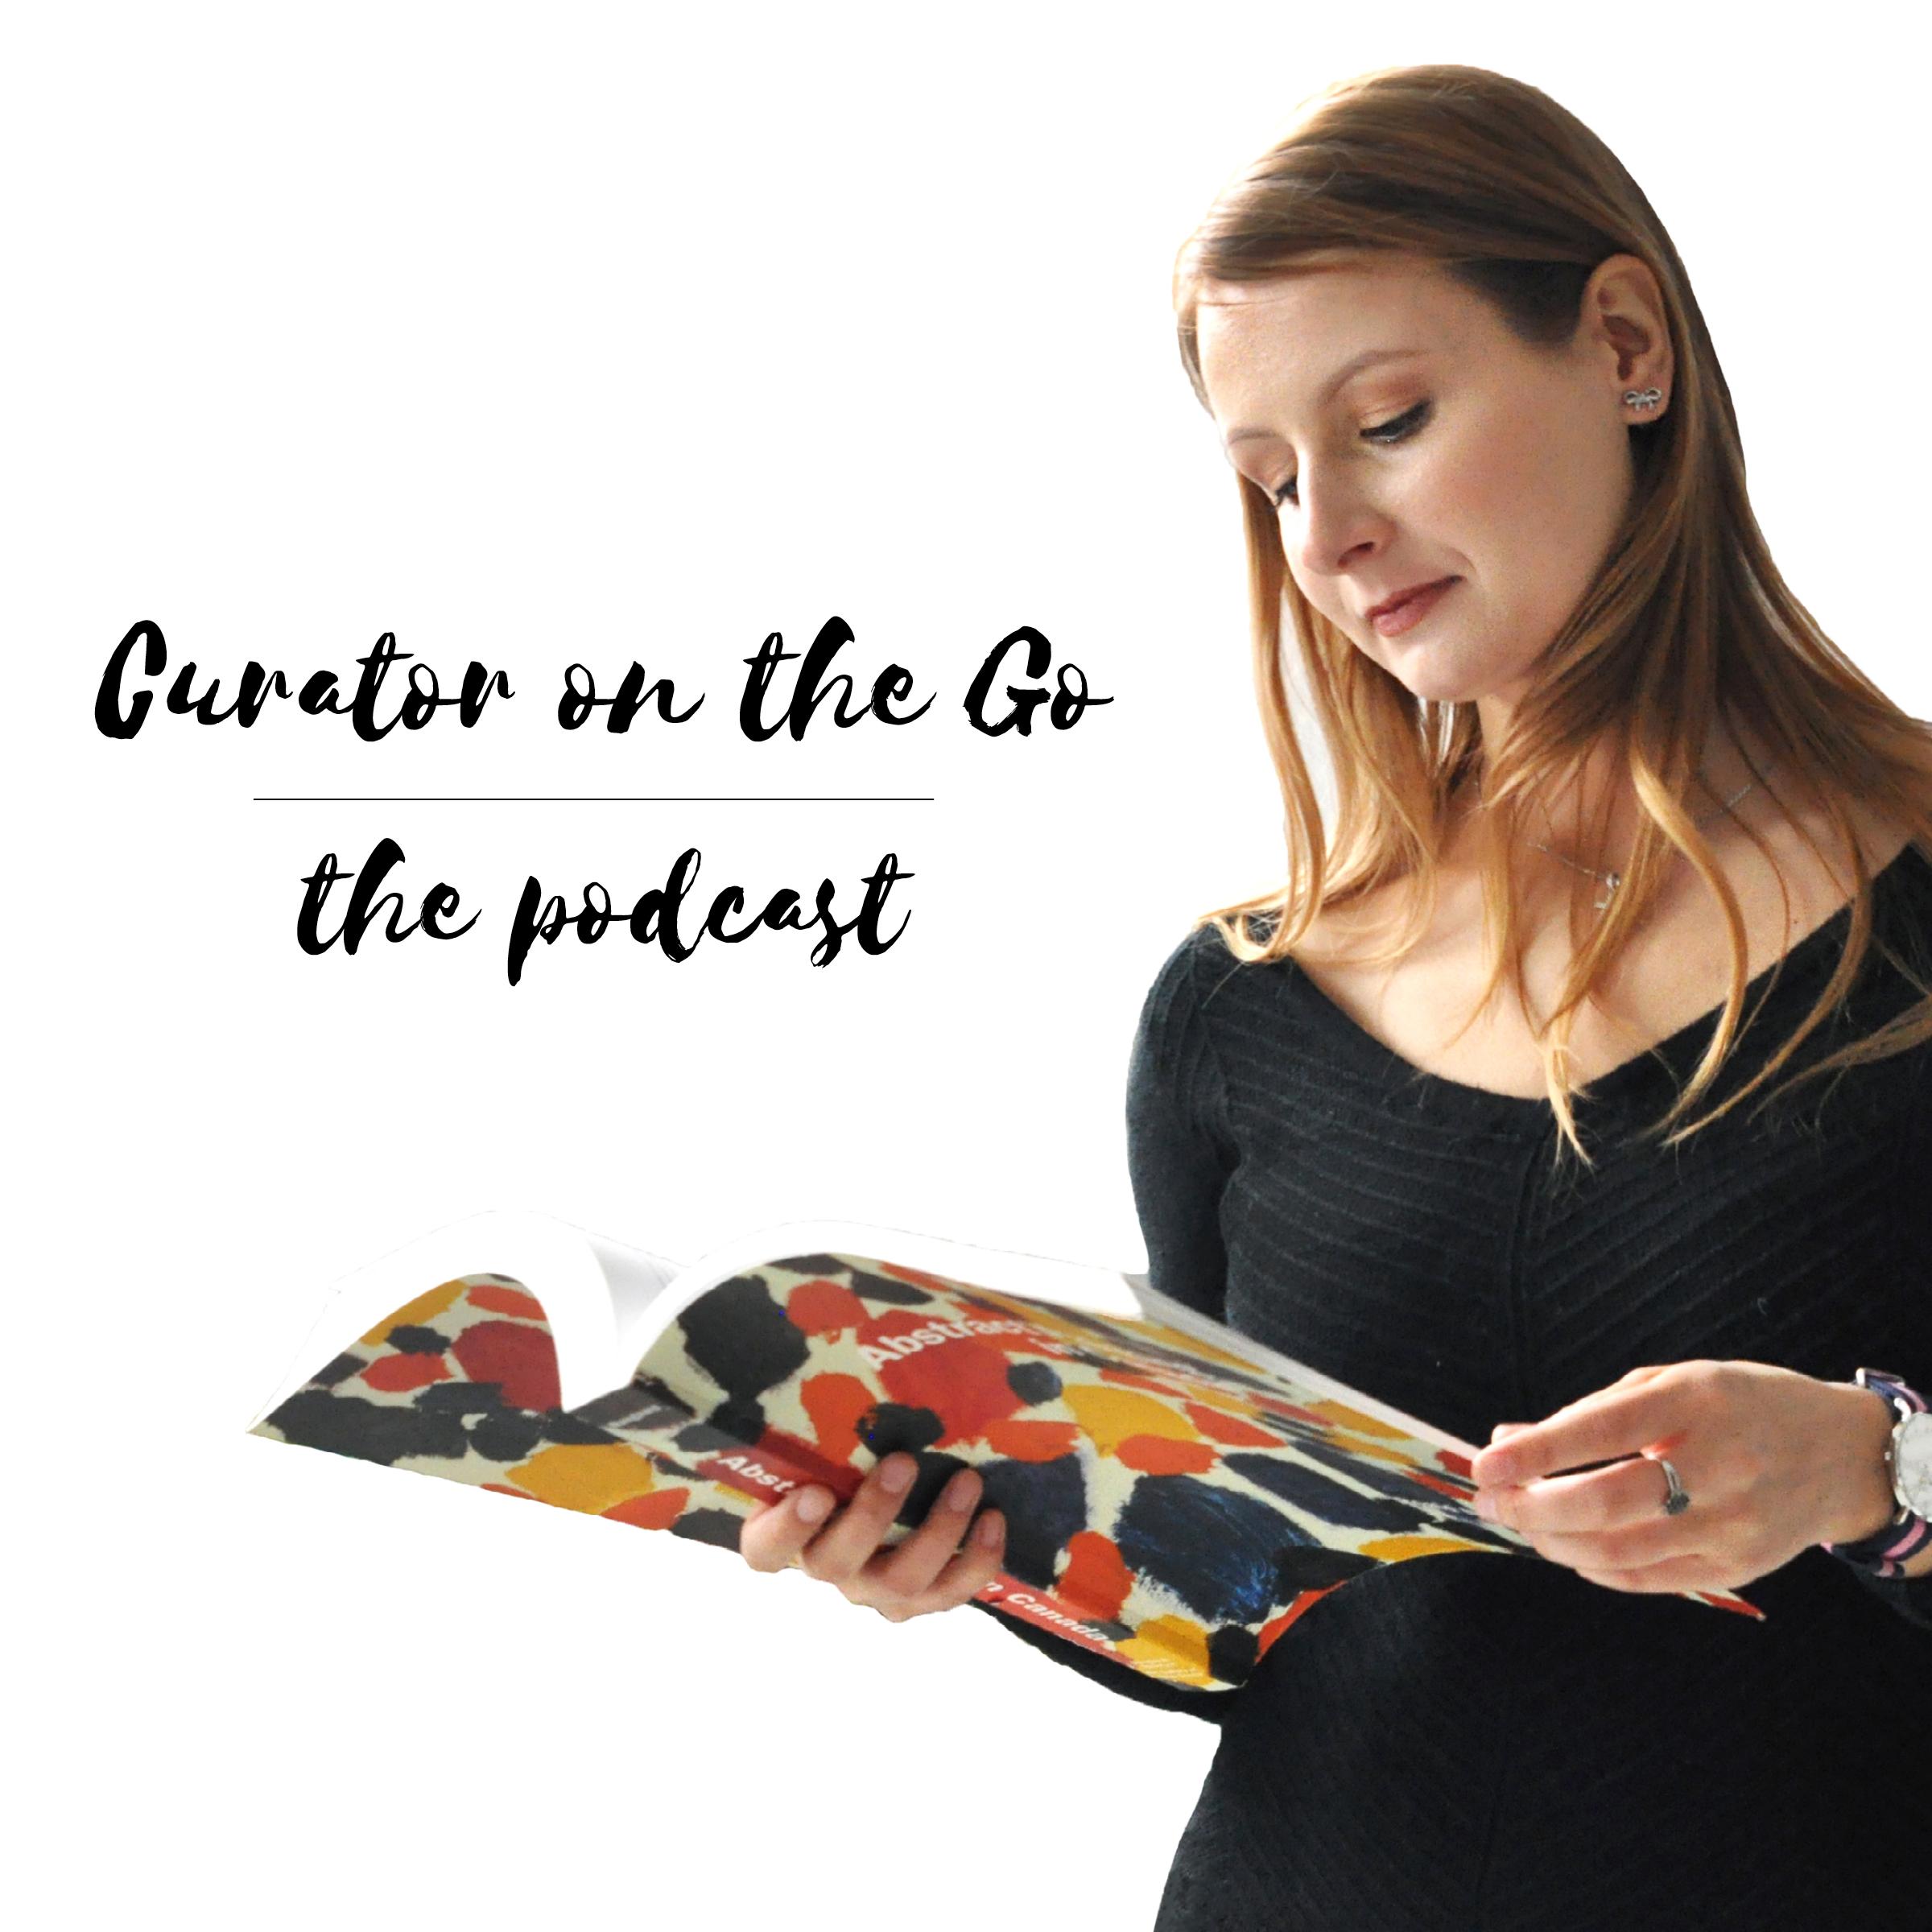 Curator on the Go Podcast show art